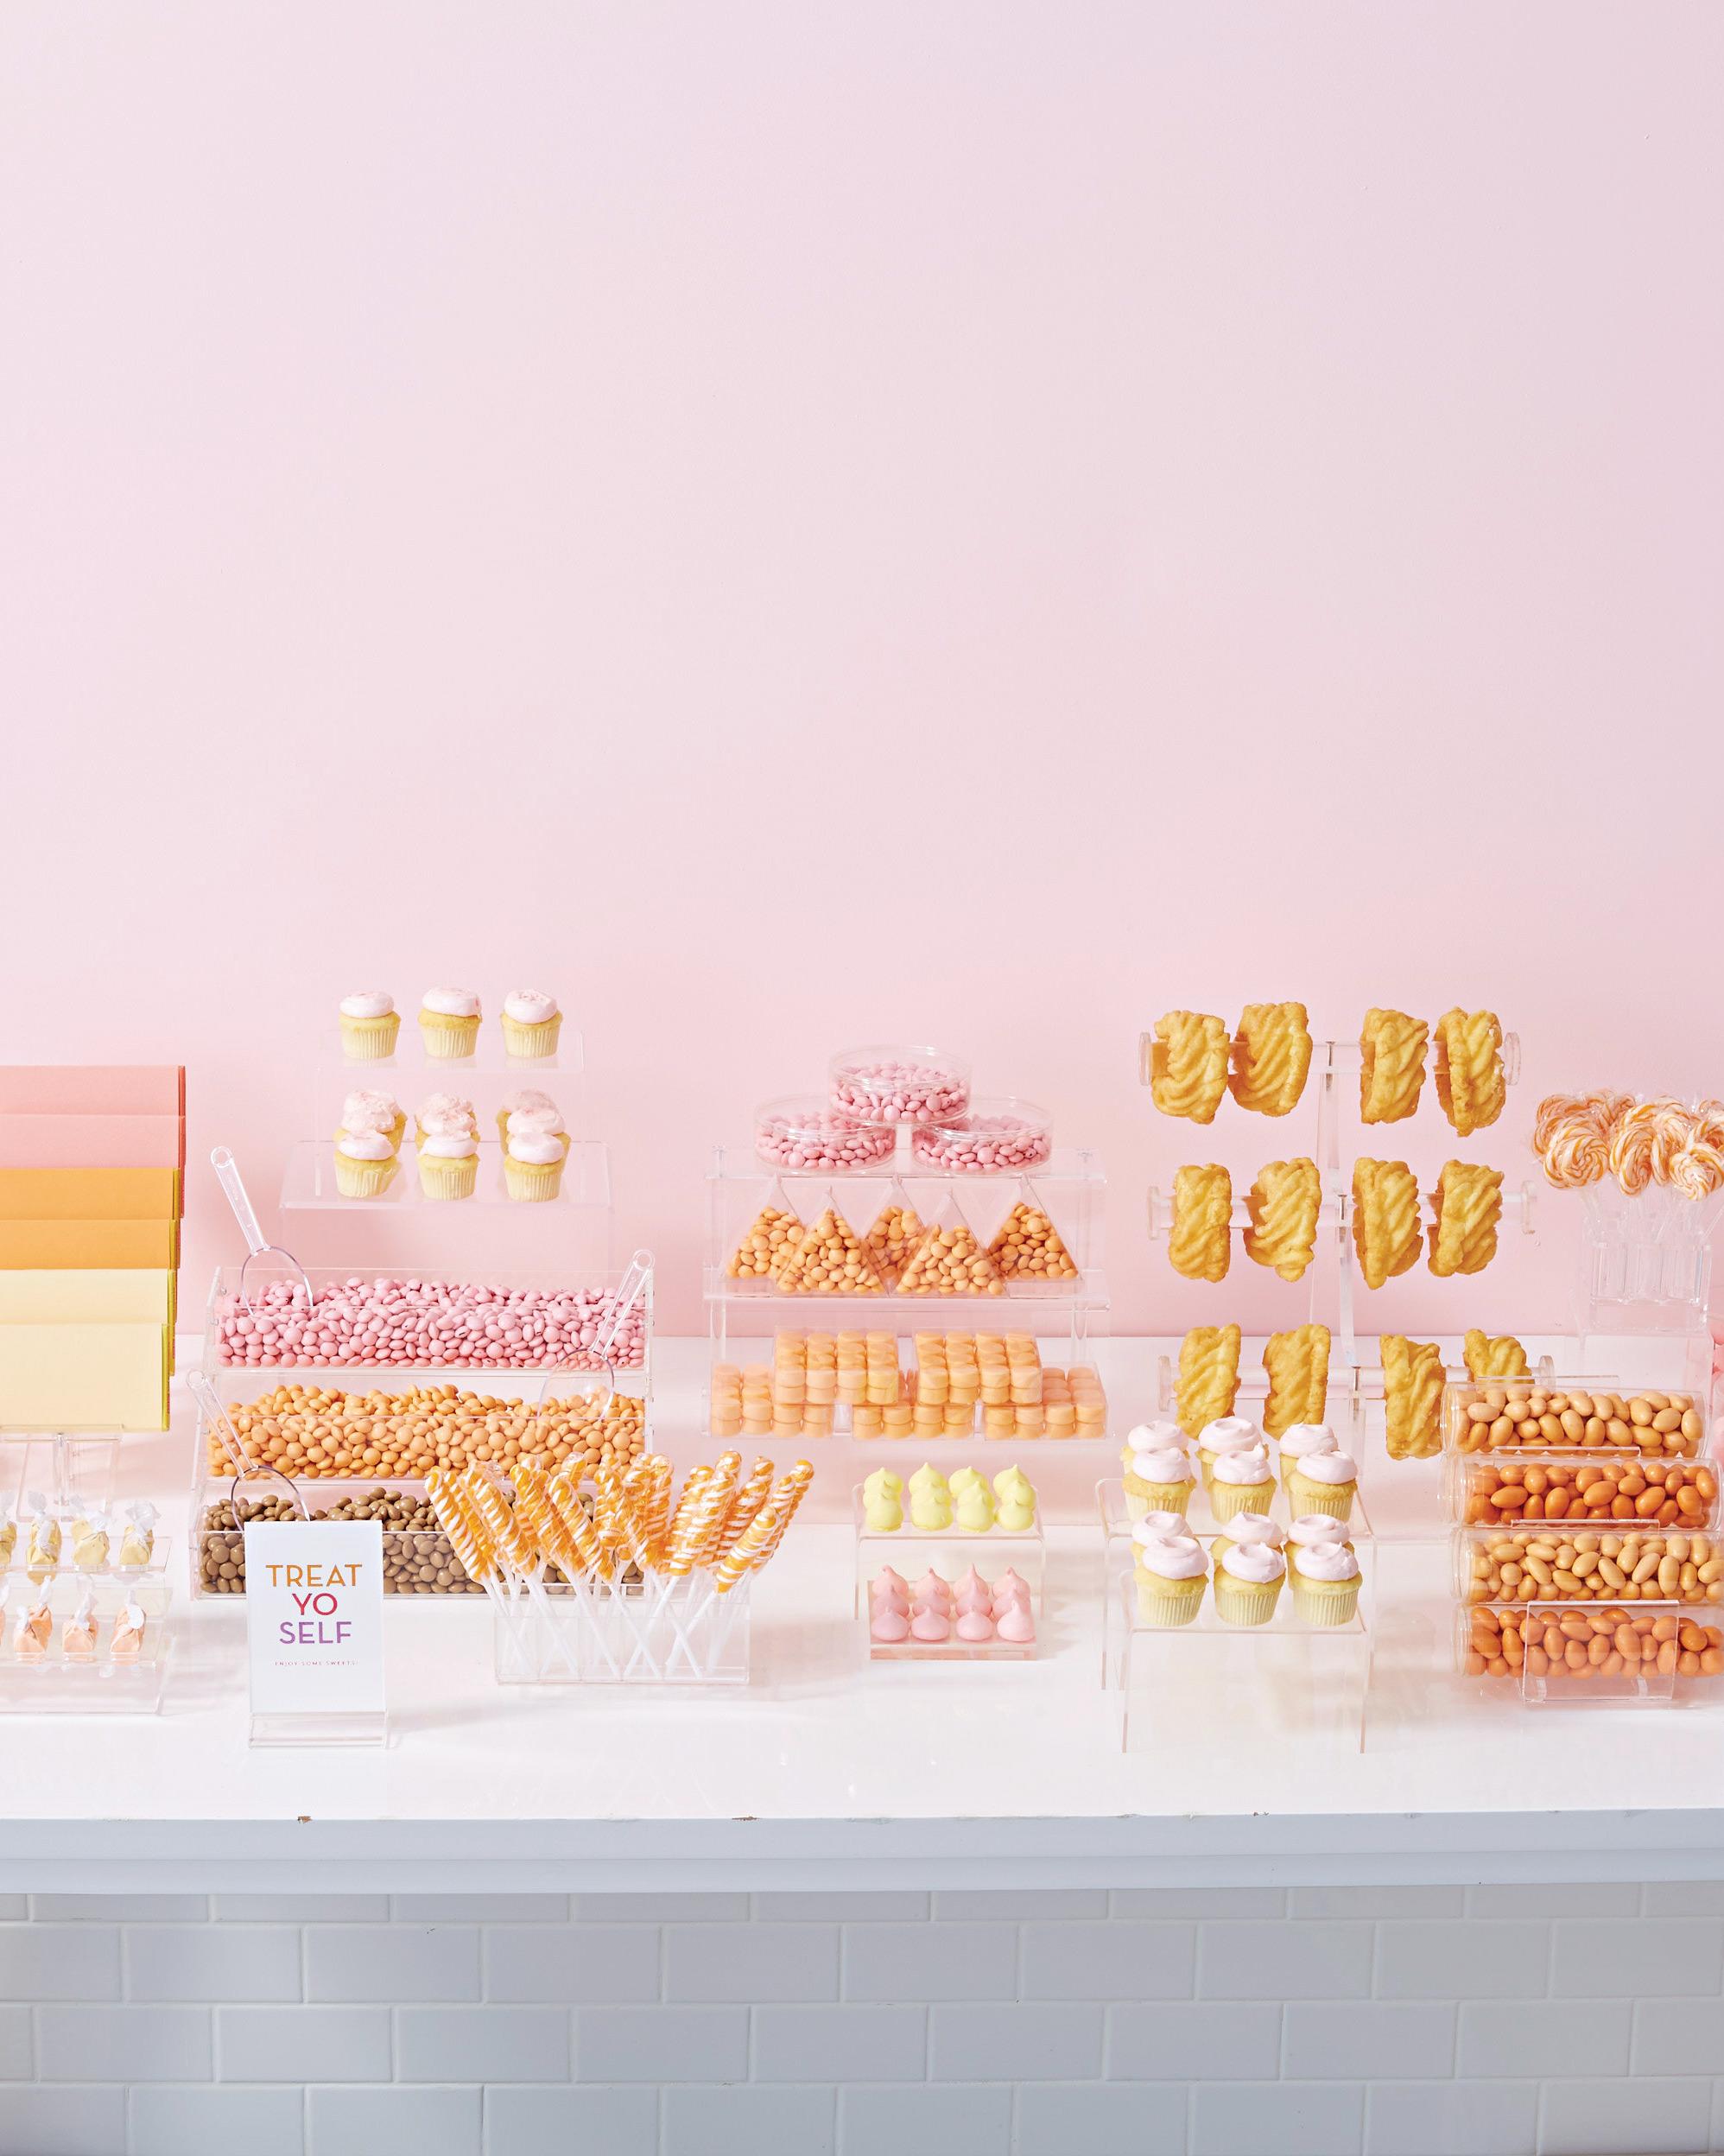 acrylic-lucite-dessert-display-326-d112790.jpg